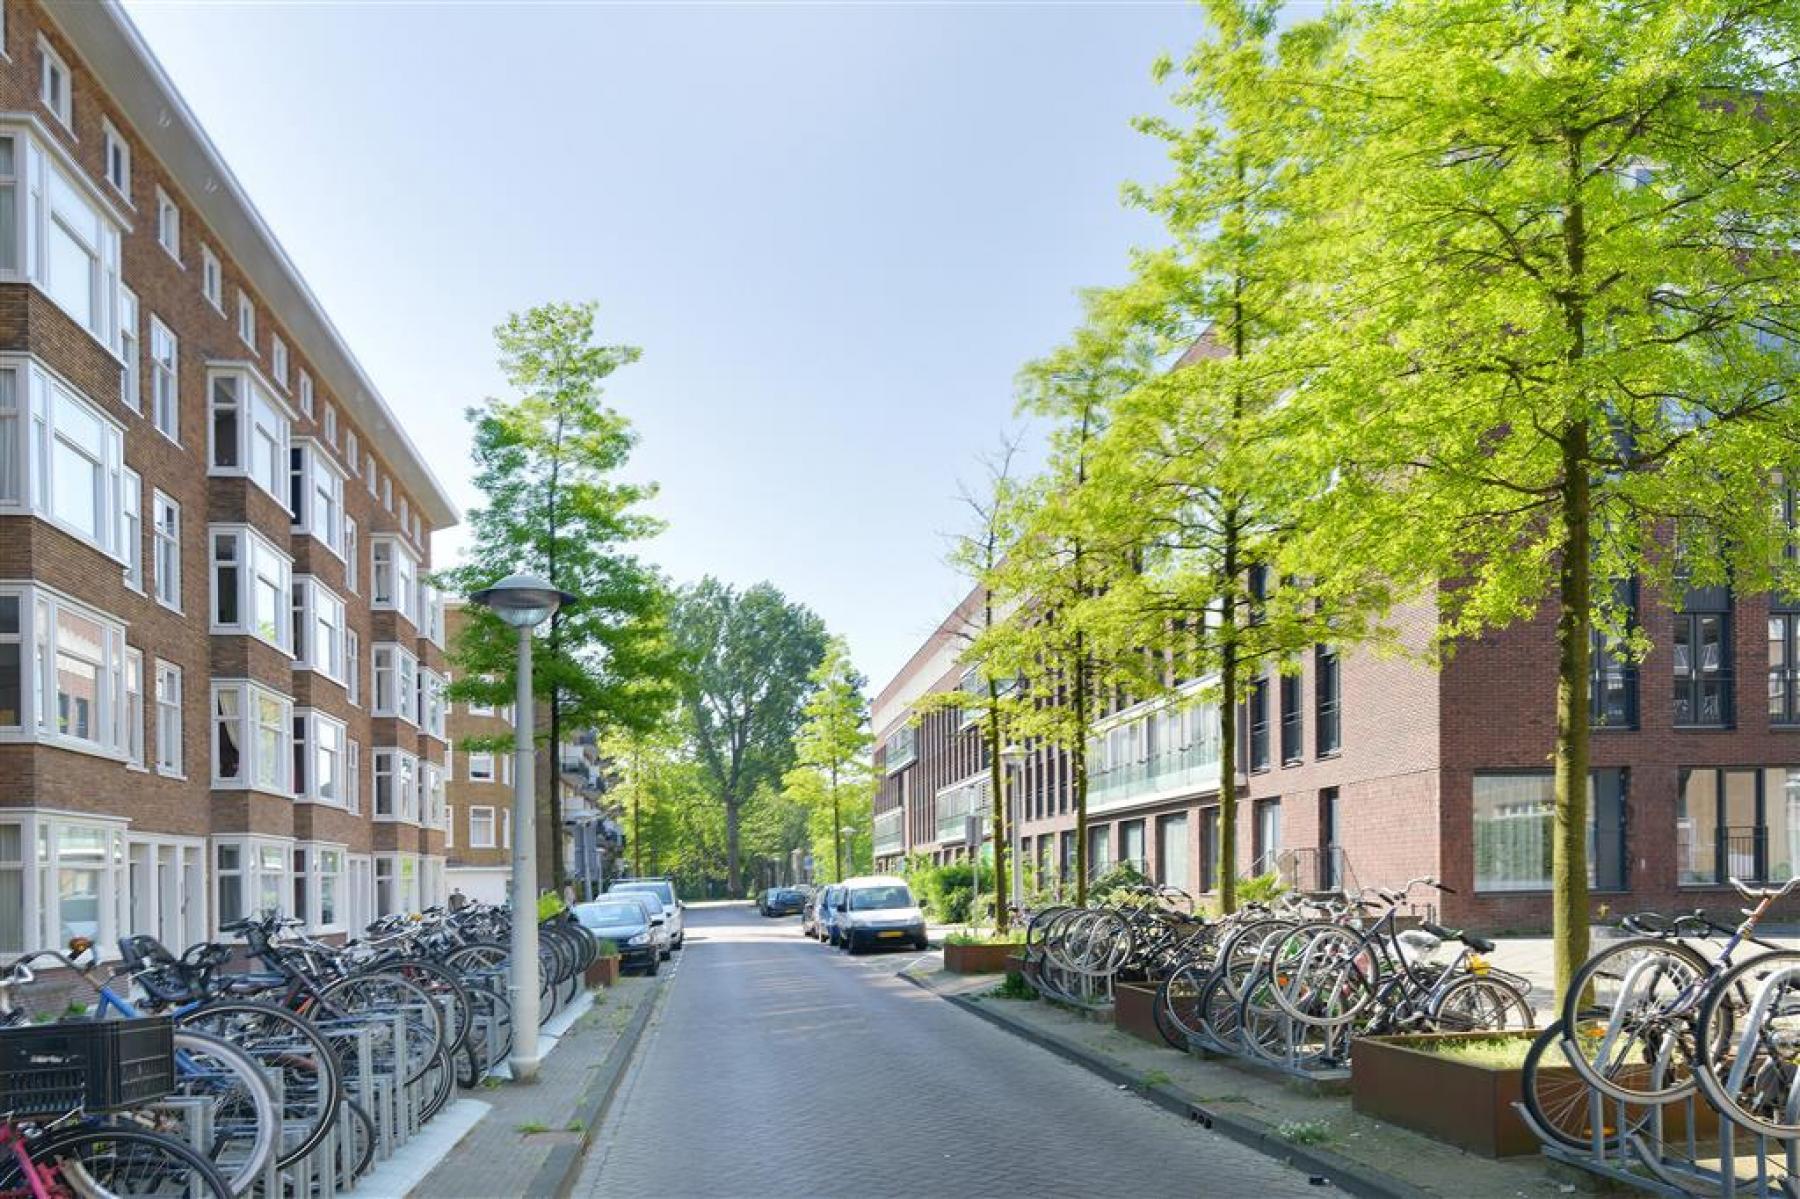 kantoorgebouw amsterdam Elckerlijcstraat fietsenstalling amsterdam centrum huur SKEPP